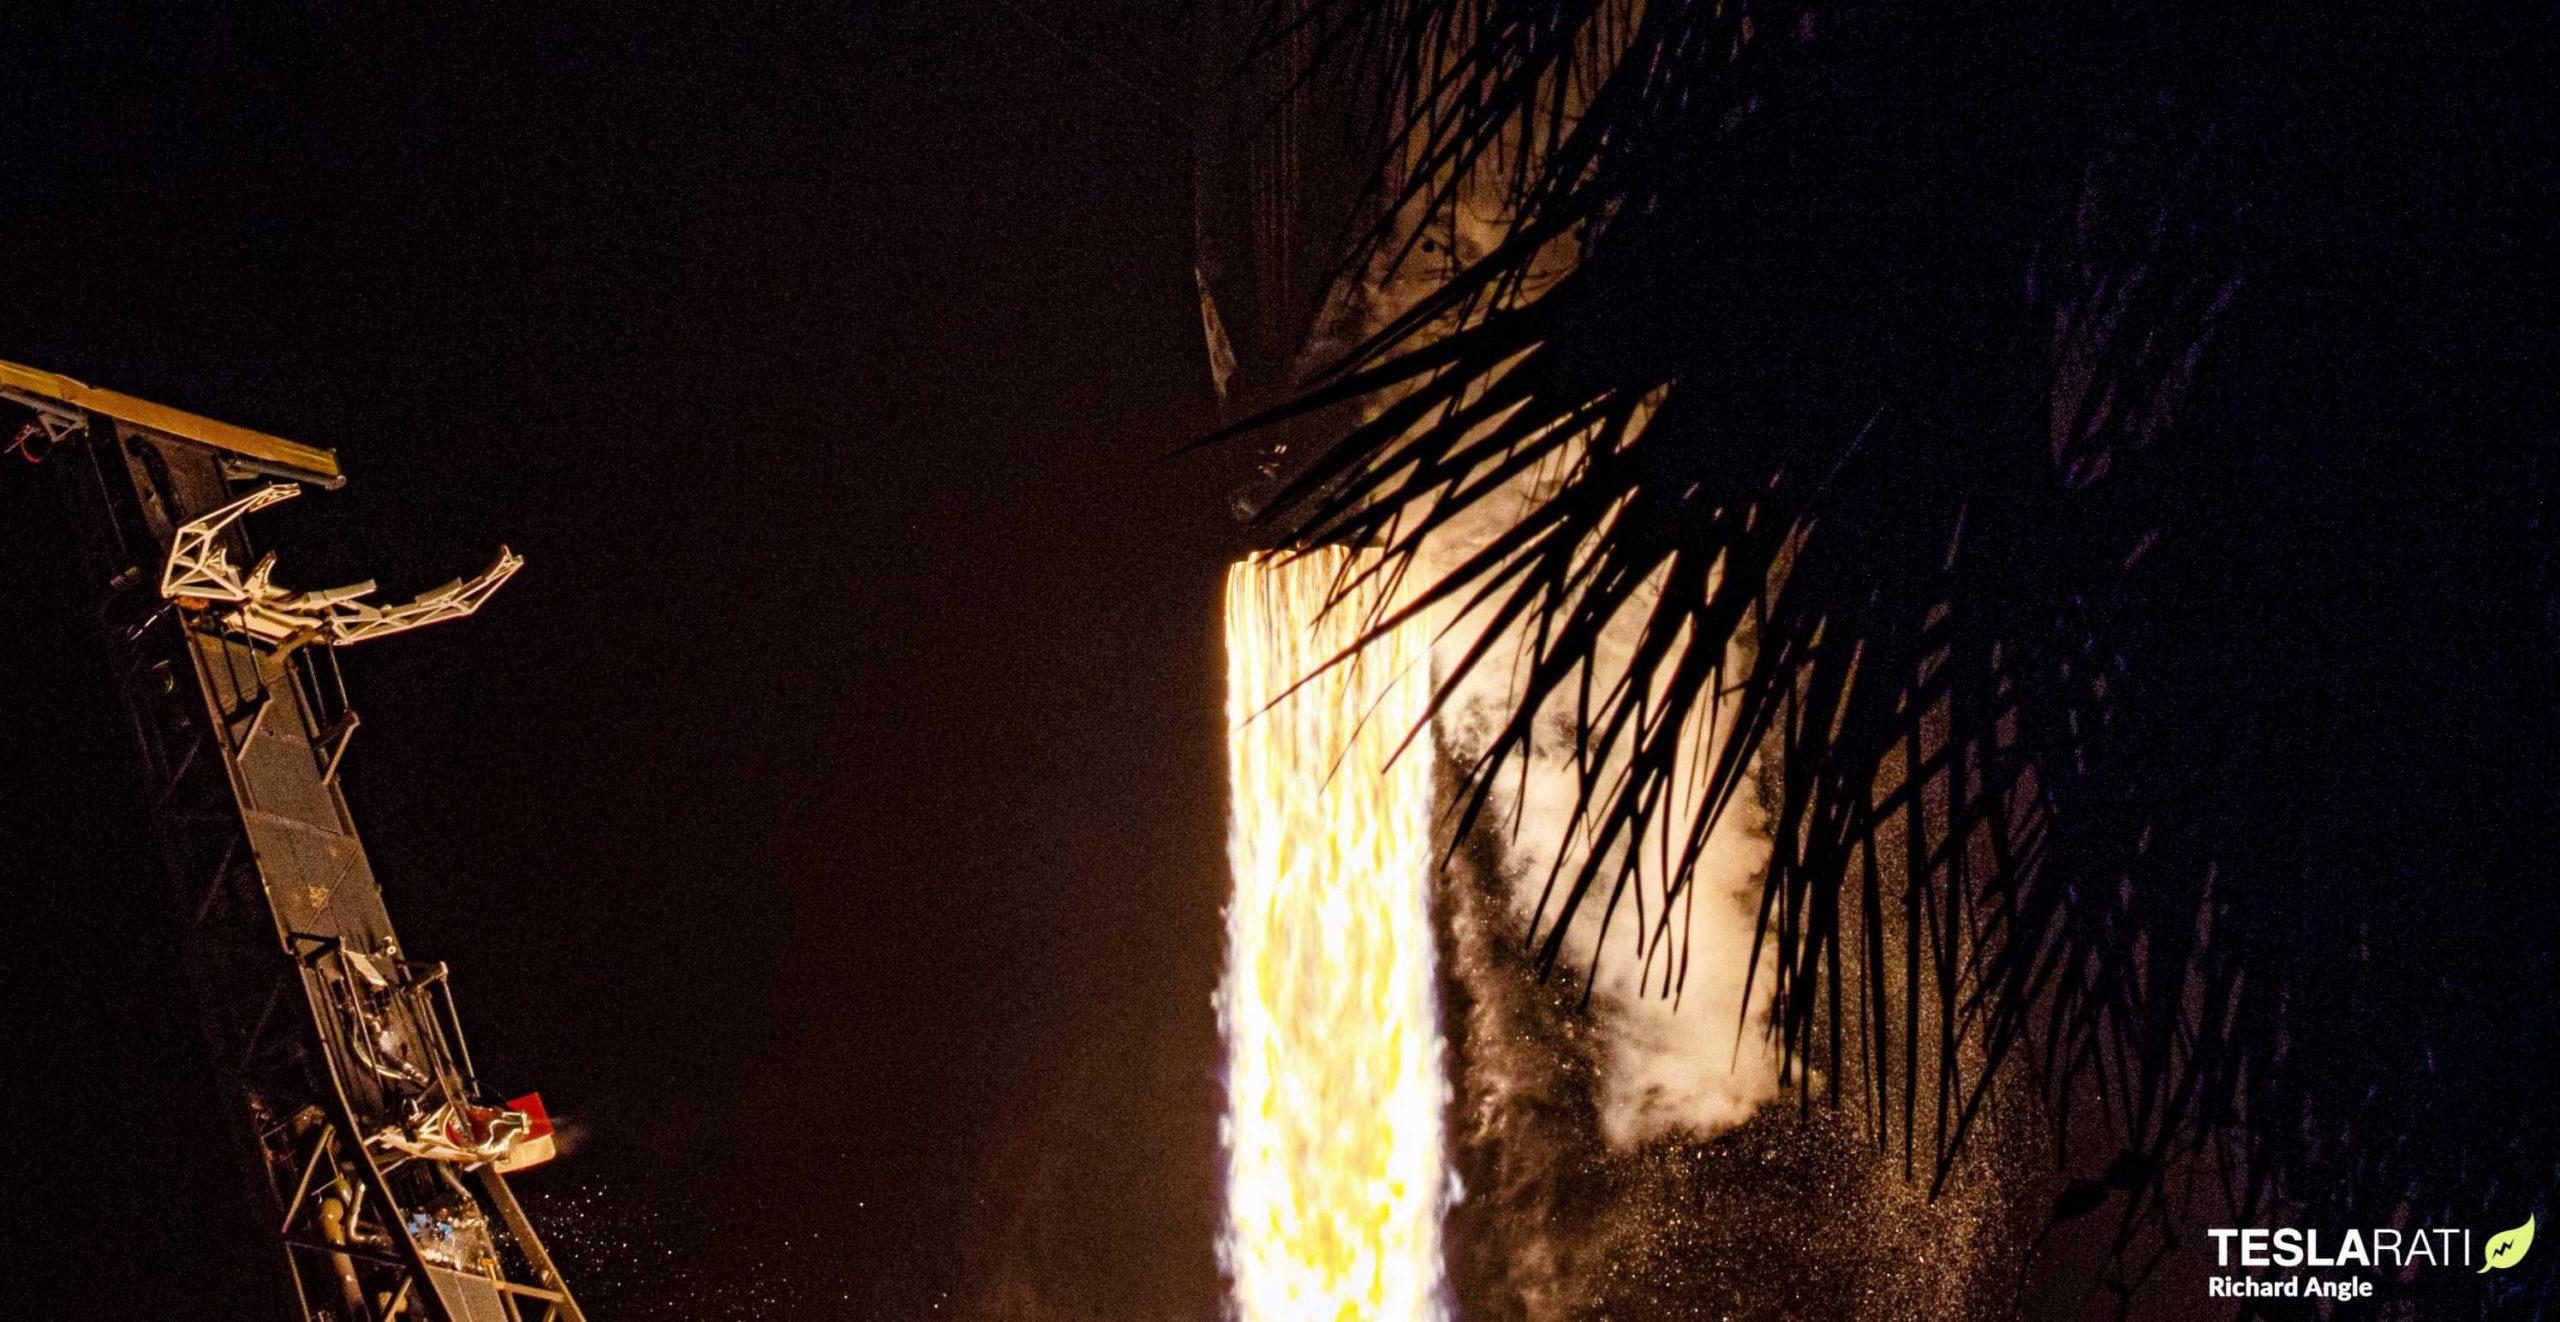 Kacific-1 Falcon 9 B1056 LC-40 121619 (Richard Angle) liftoff 3 crop (c)